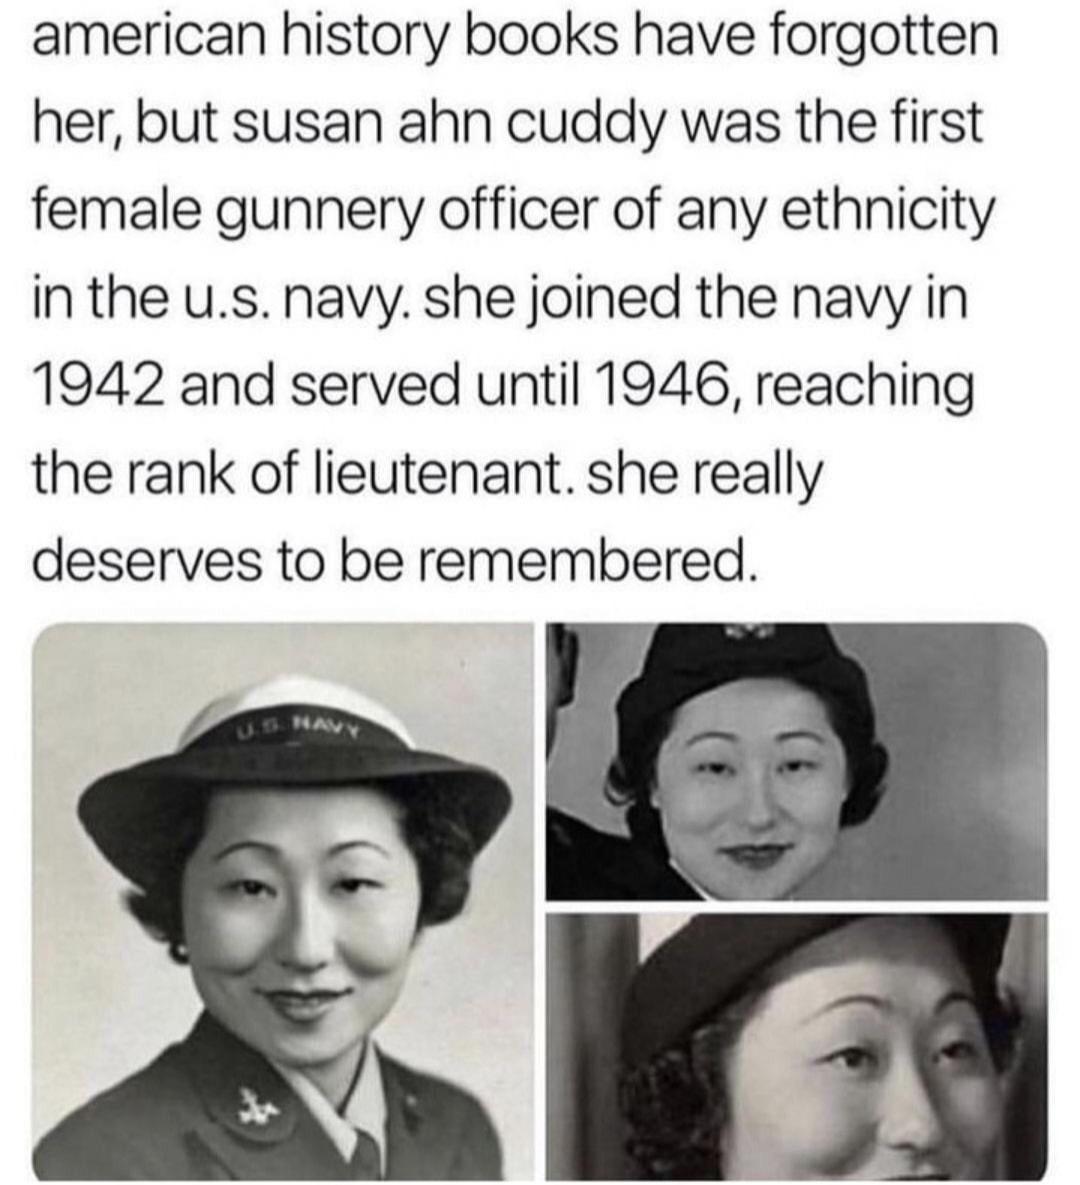 [Image] Susan Ahn Cuddy